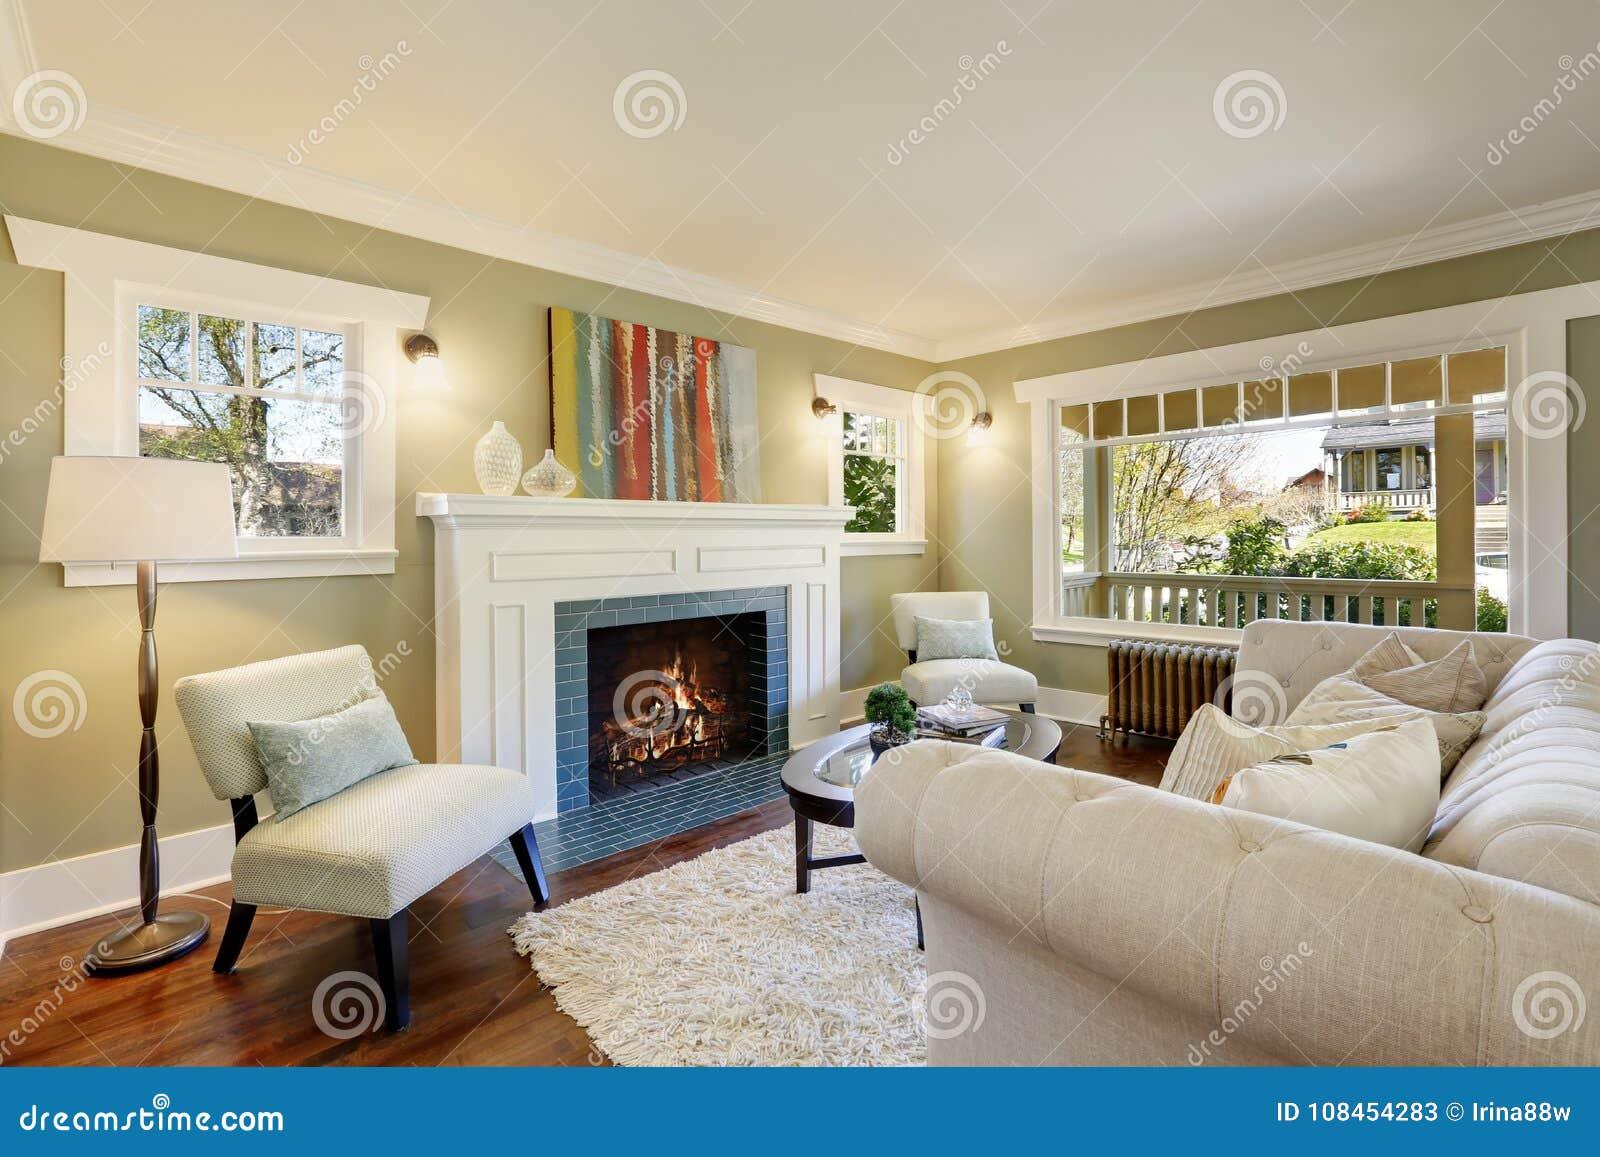 Moderne Traditionele Woonkamer : Elegante groene woonkamer met een traditionele open haard stock